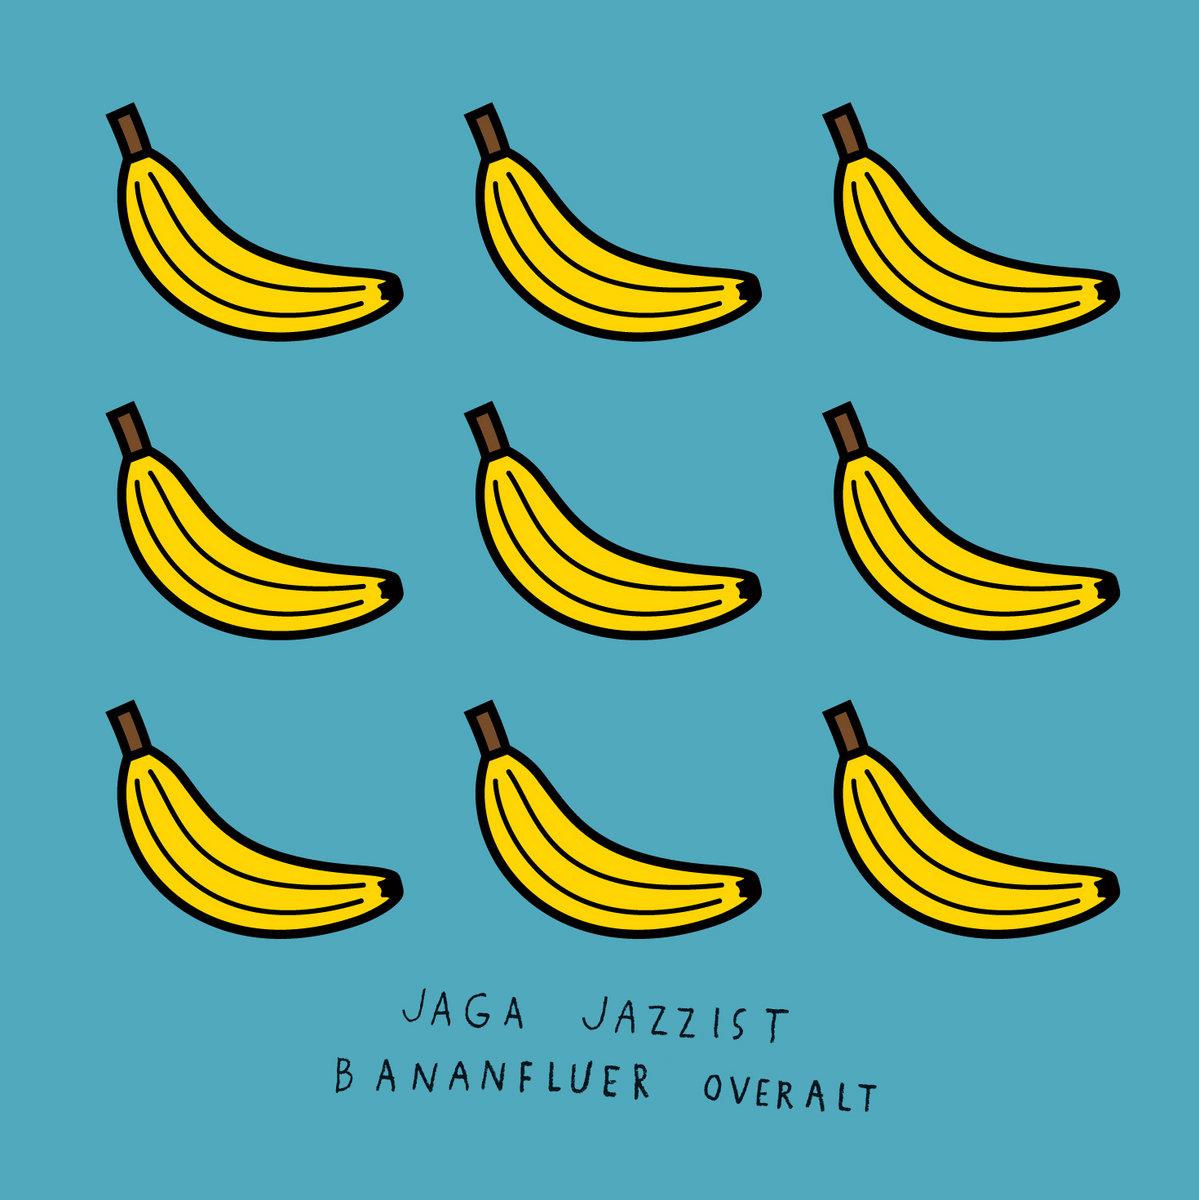 lithuania jaga jazzist bananfluer overalt